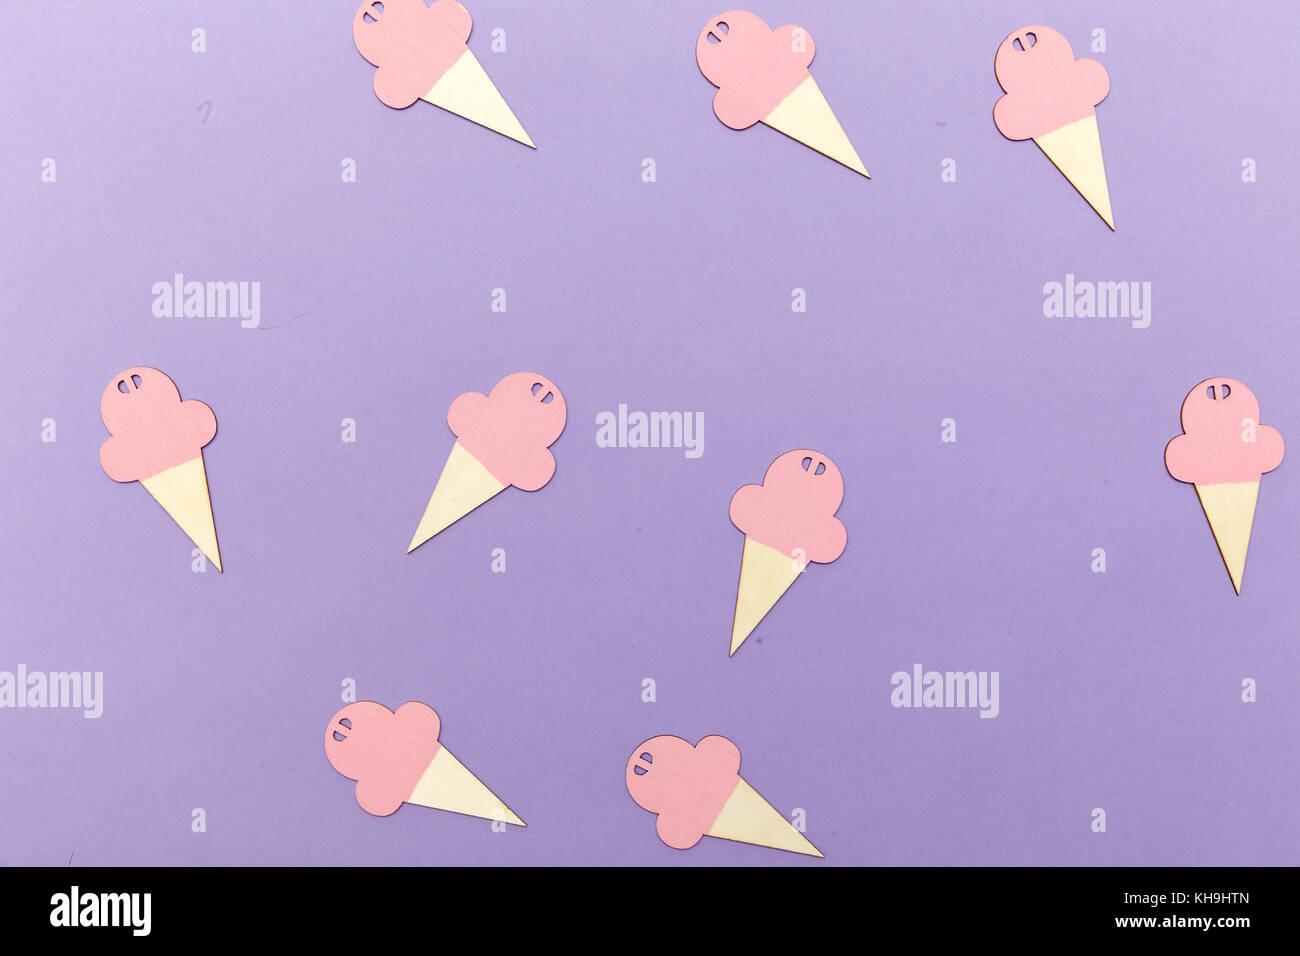 Cutouts Stock Photos & Cutouts Stock Images - Alamy